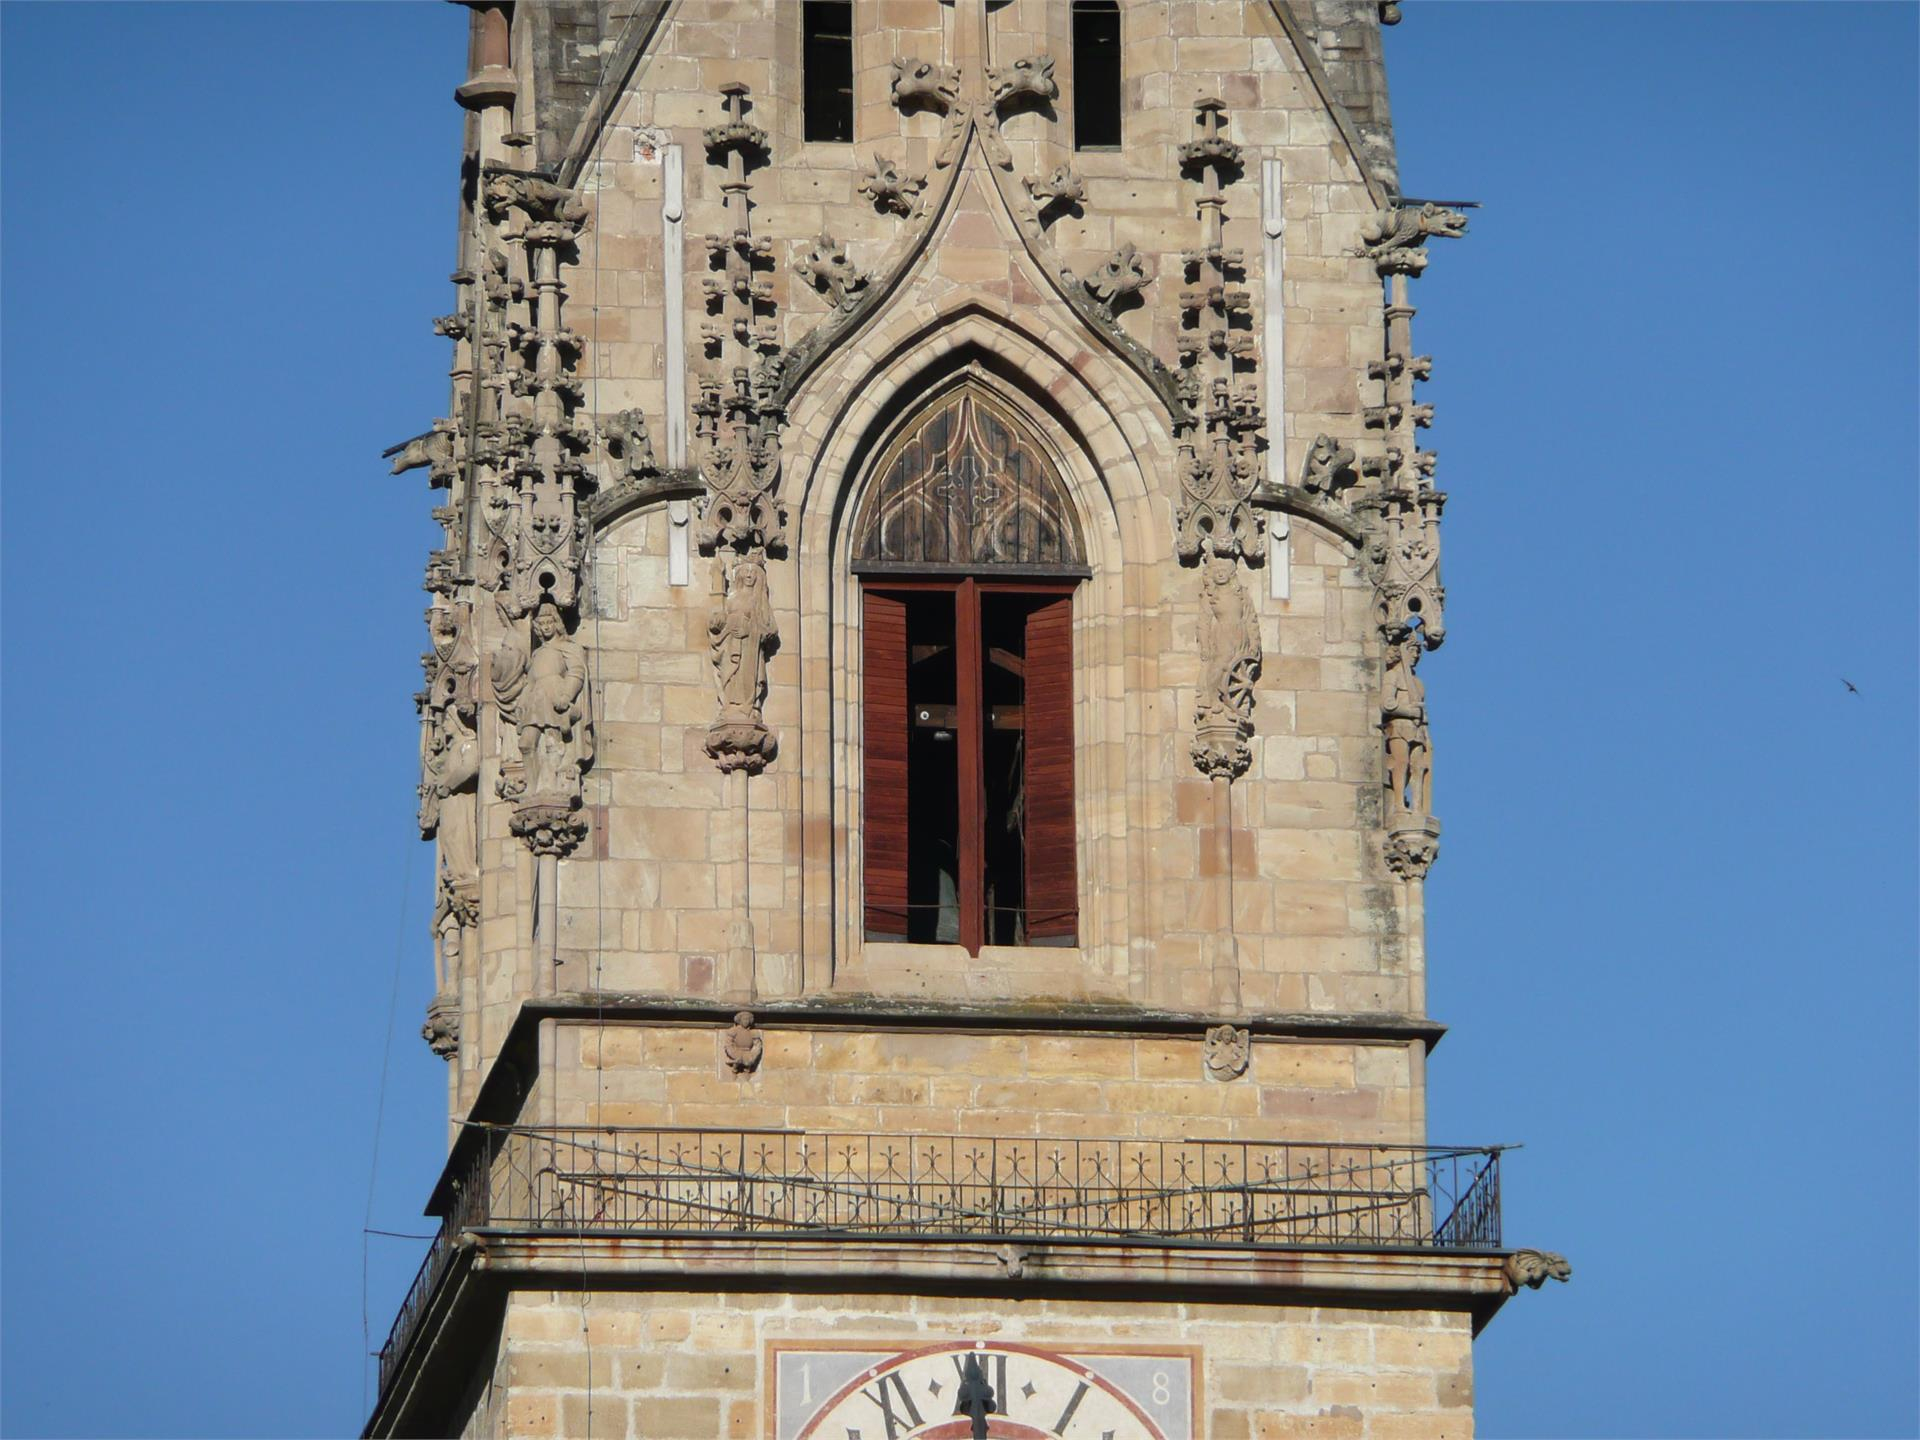 Chiesa parrocchiale Santa Julitta e San Quirikus